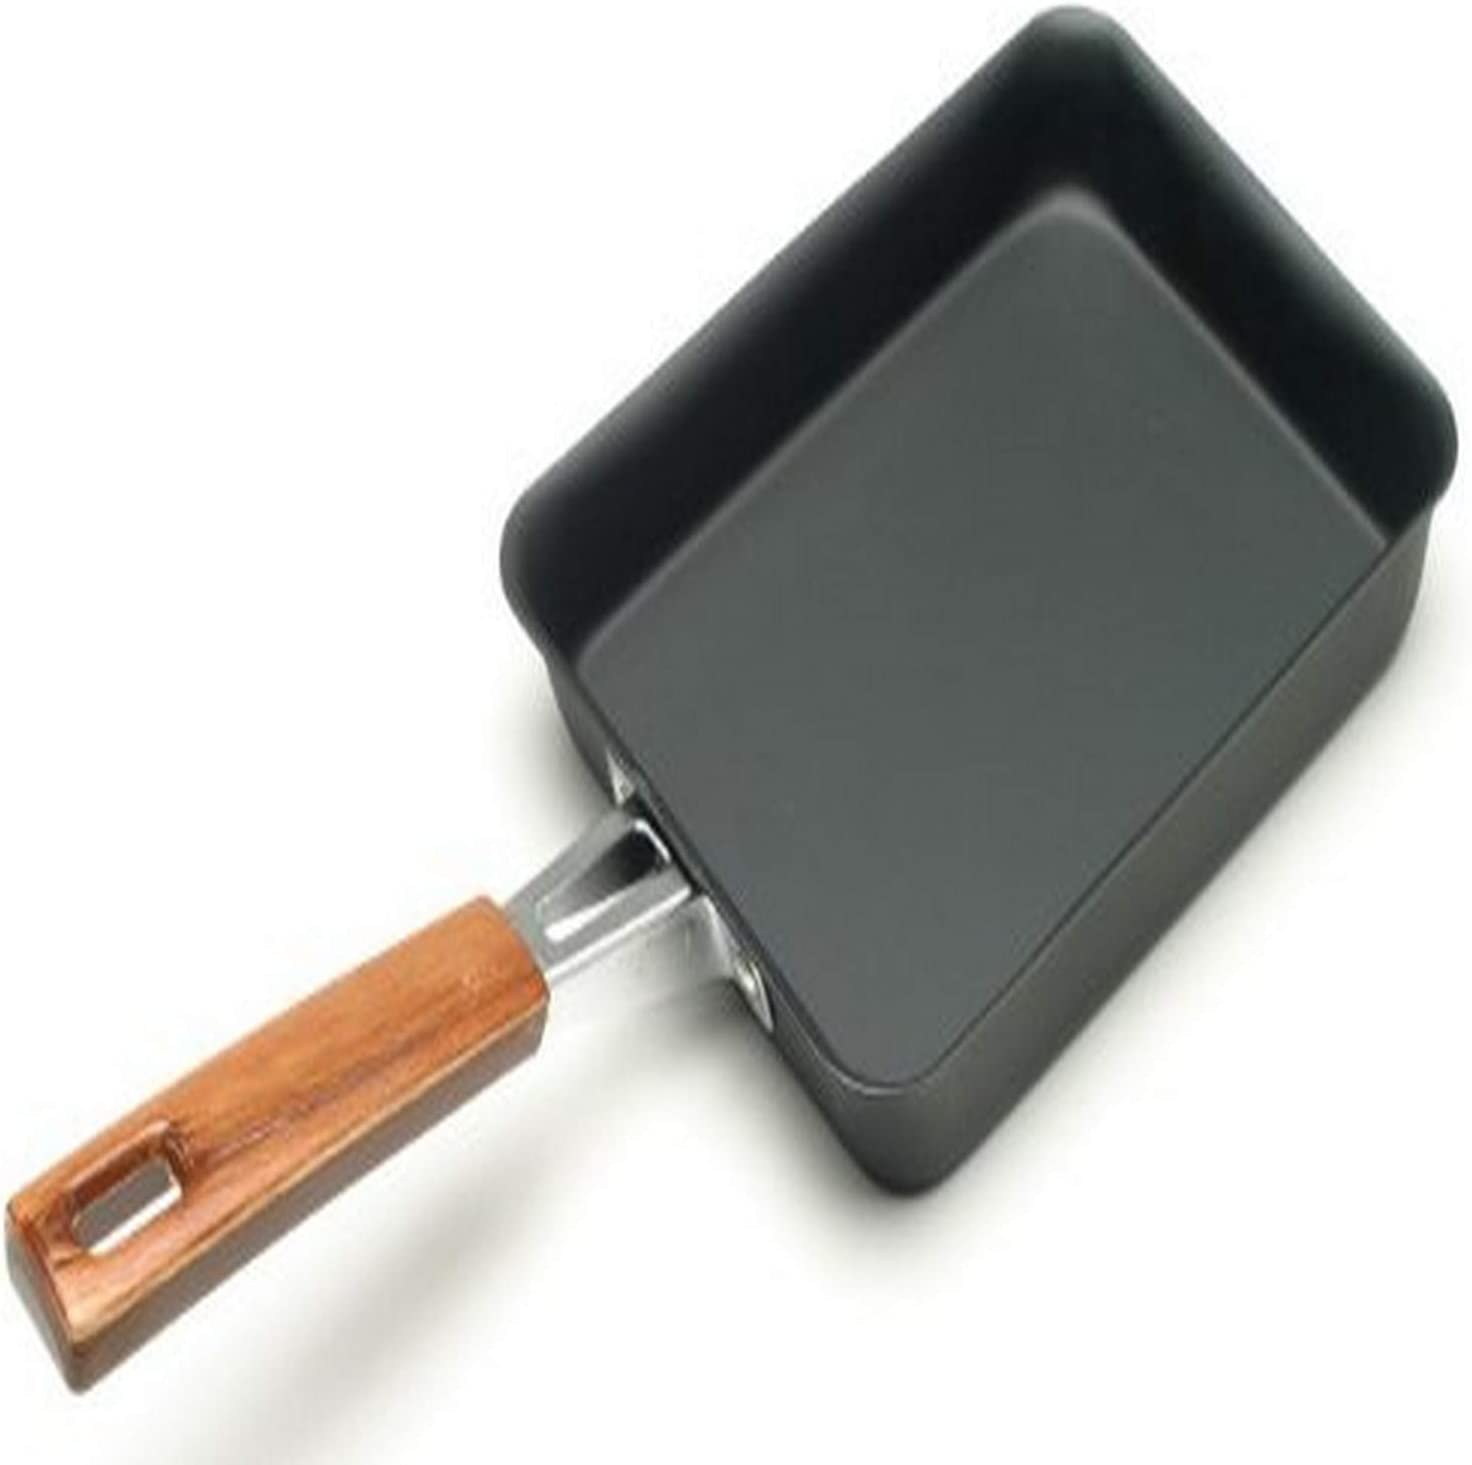 Tamagoyaki Japanese Omelette Pan Cast Iron Wooden Handle